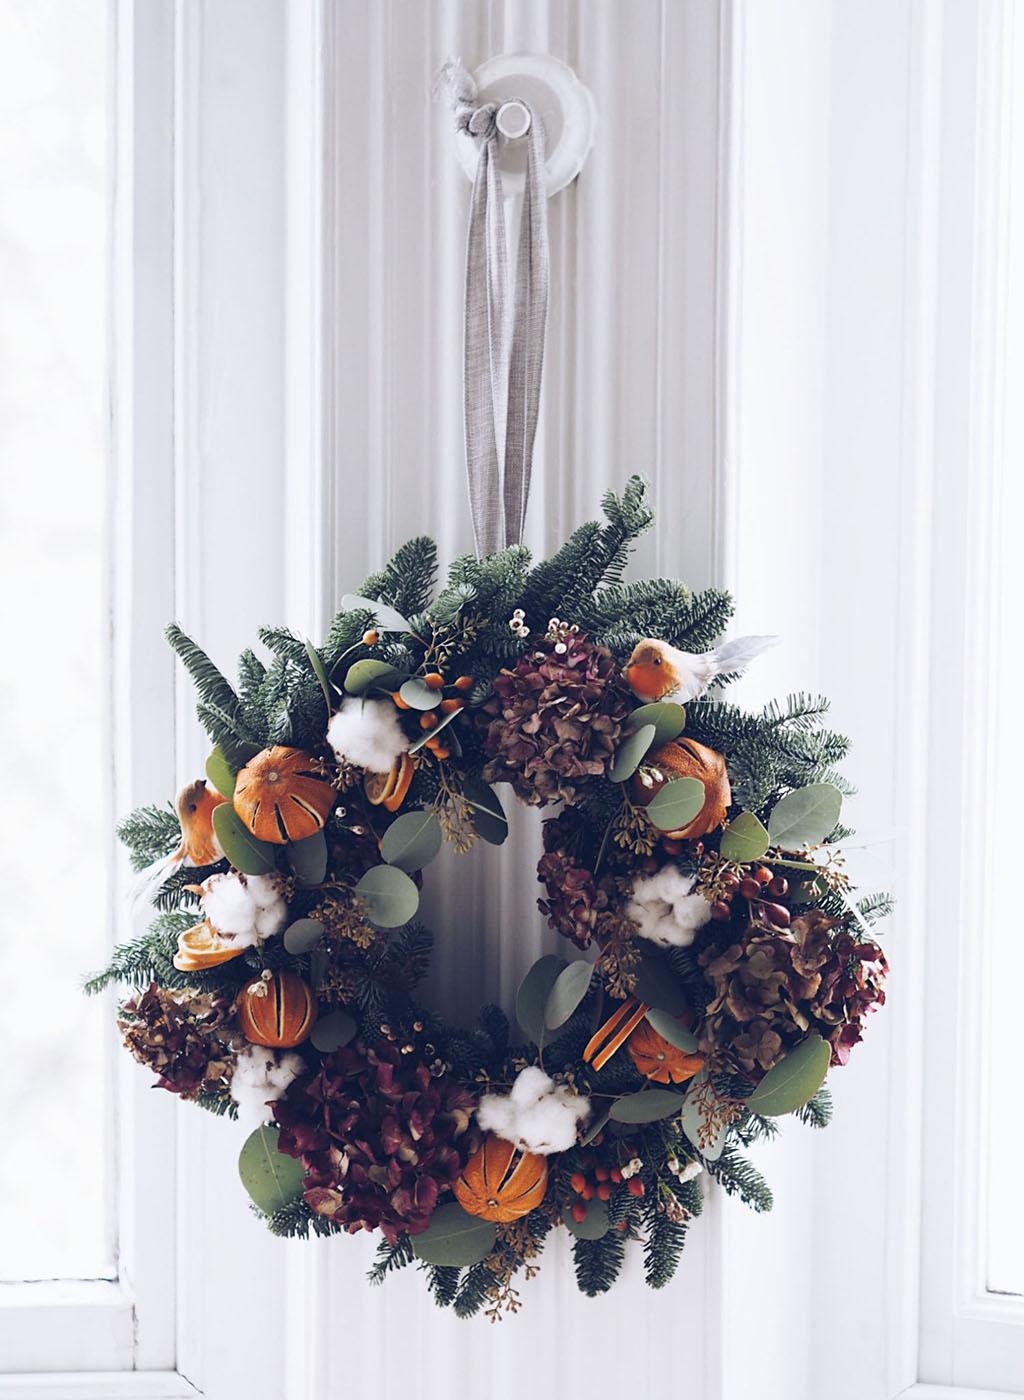 Christmas wreath making lesson with Kate Langdale Brighton Lareese Craig Brighton blogger